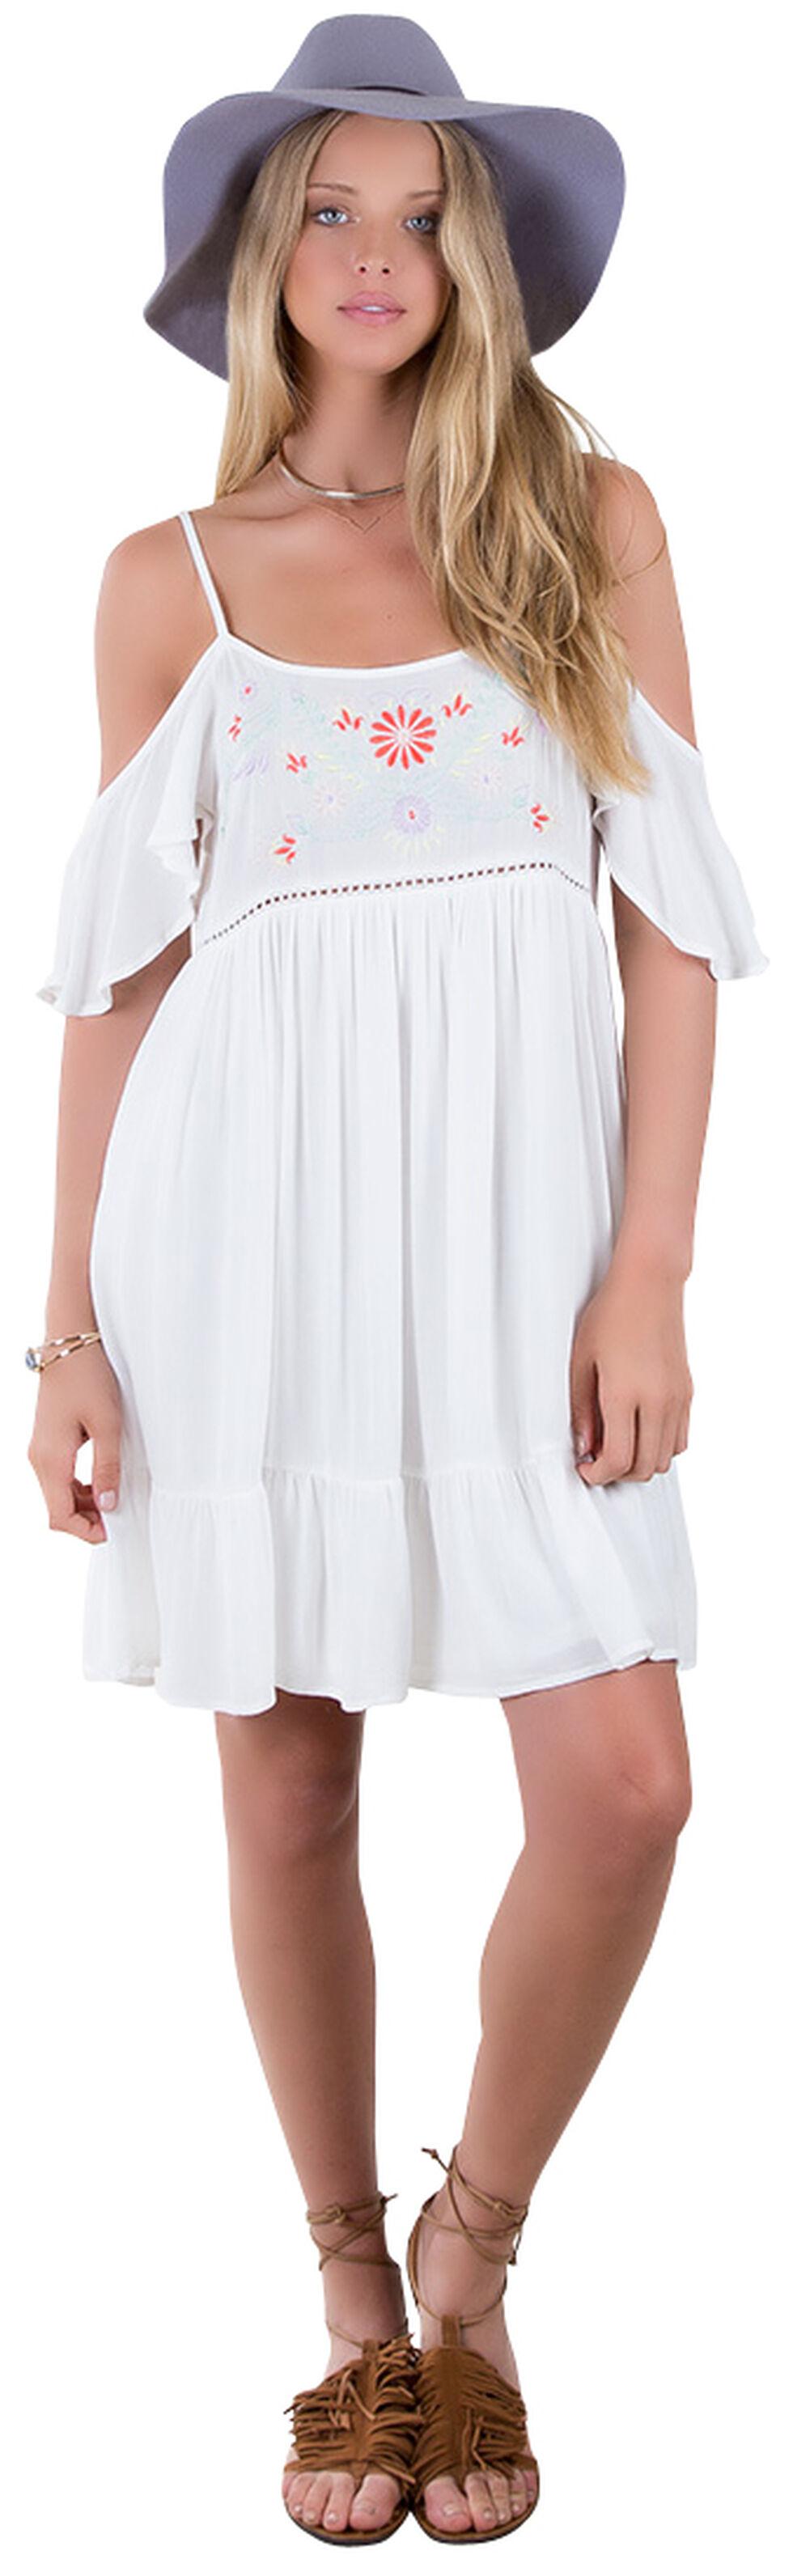 Others Follow White Harbor Mist Off Shoulder Dress , White, hi-res